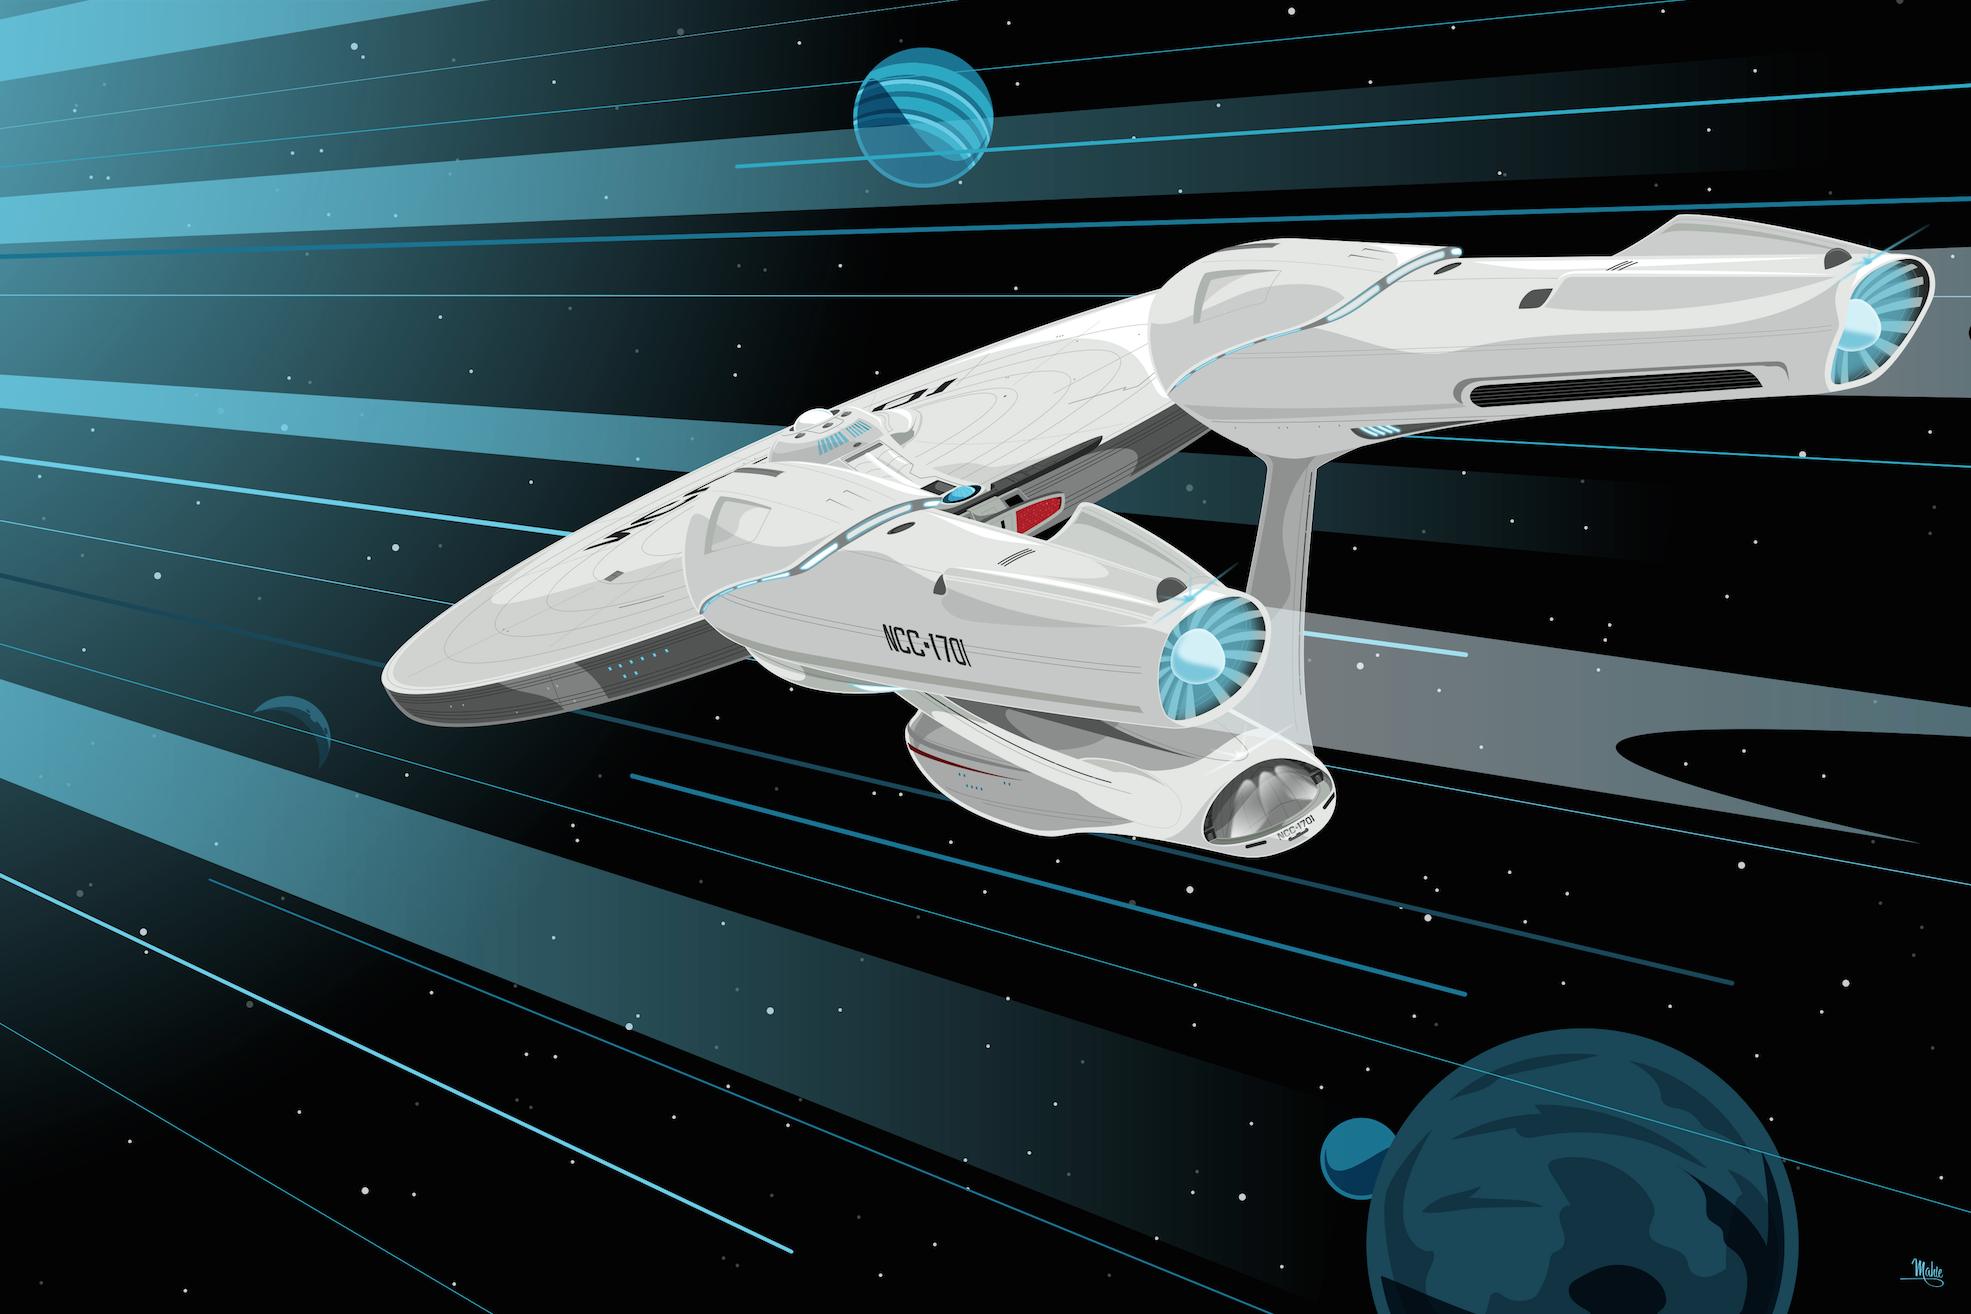 Screen Shot 2016 07 07 At 5 17 10 Pm Png 1 971 1 314 Pixels Star Trek Wallpaper Star Trek Posters Star Trek Starships